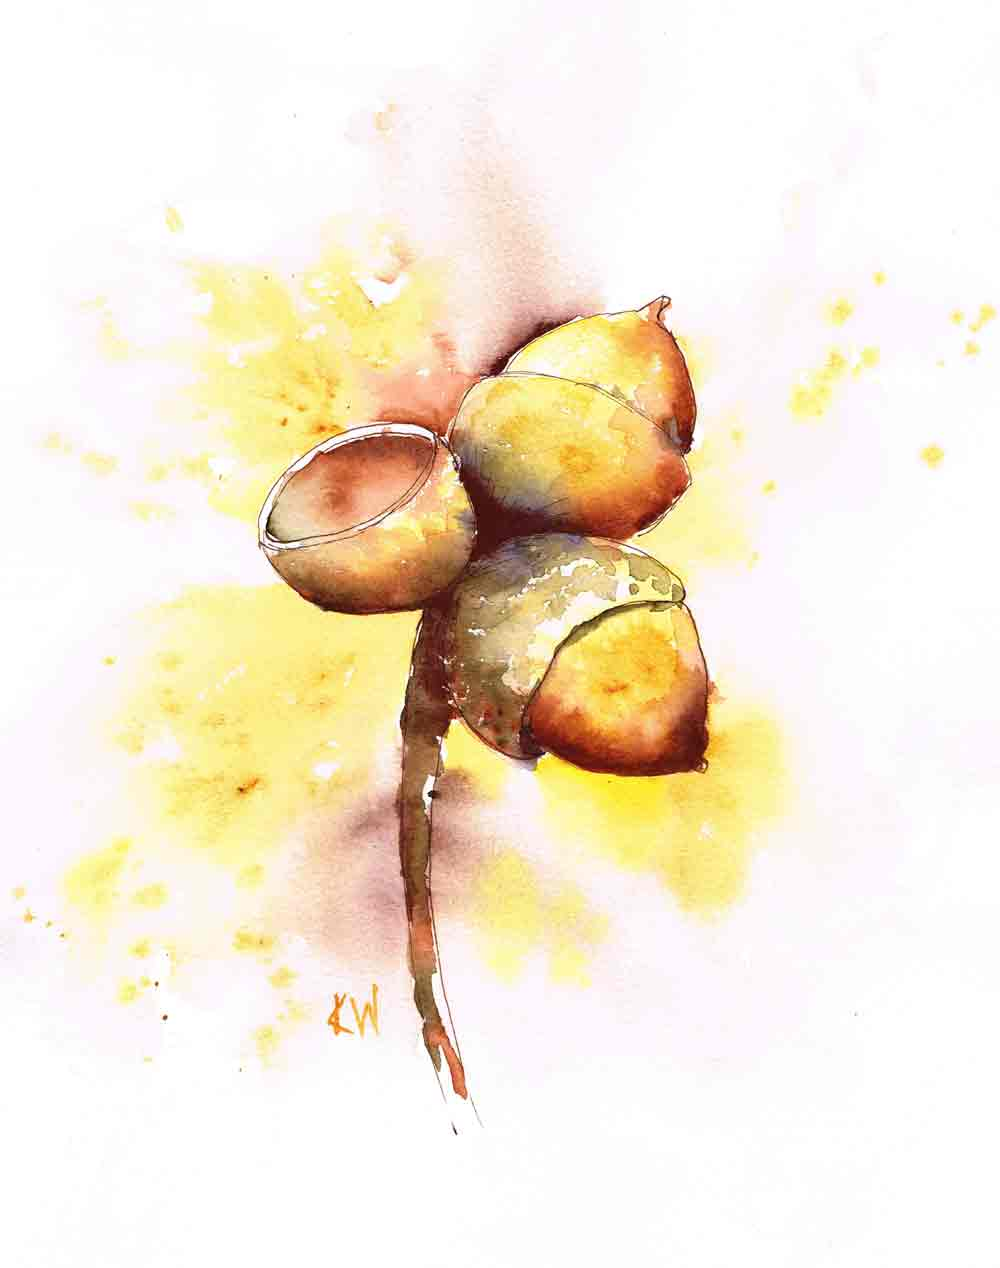 acorns-kw.jpg